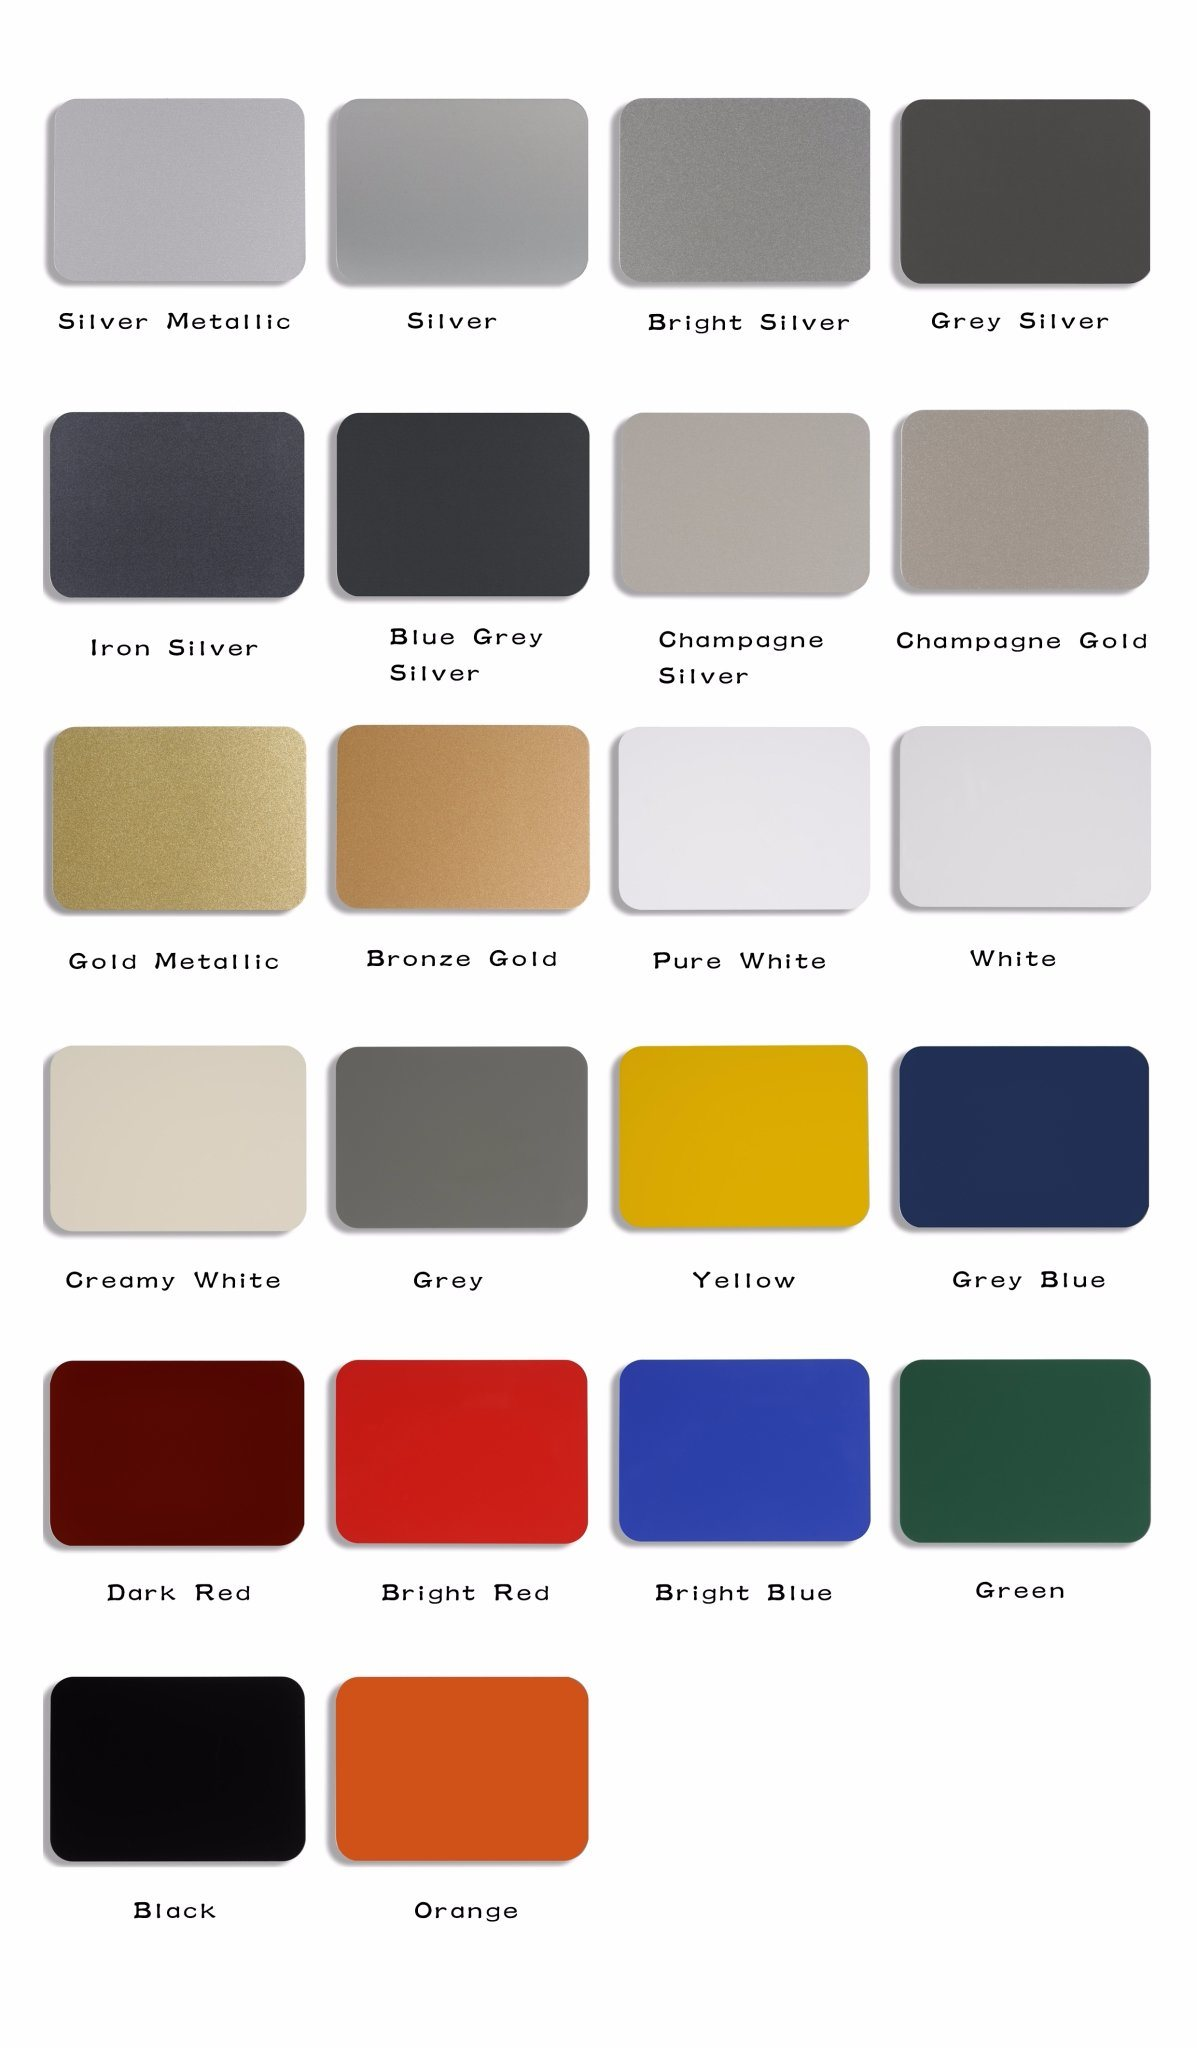 Aluis Exterior 3mm Aluminium Composite Panel-0.30mm Aluminium Skin Thickness of FEVE High Glossiness Grey Blue